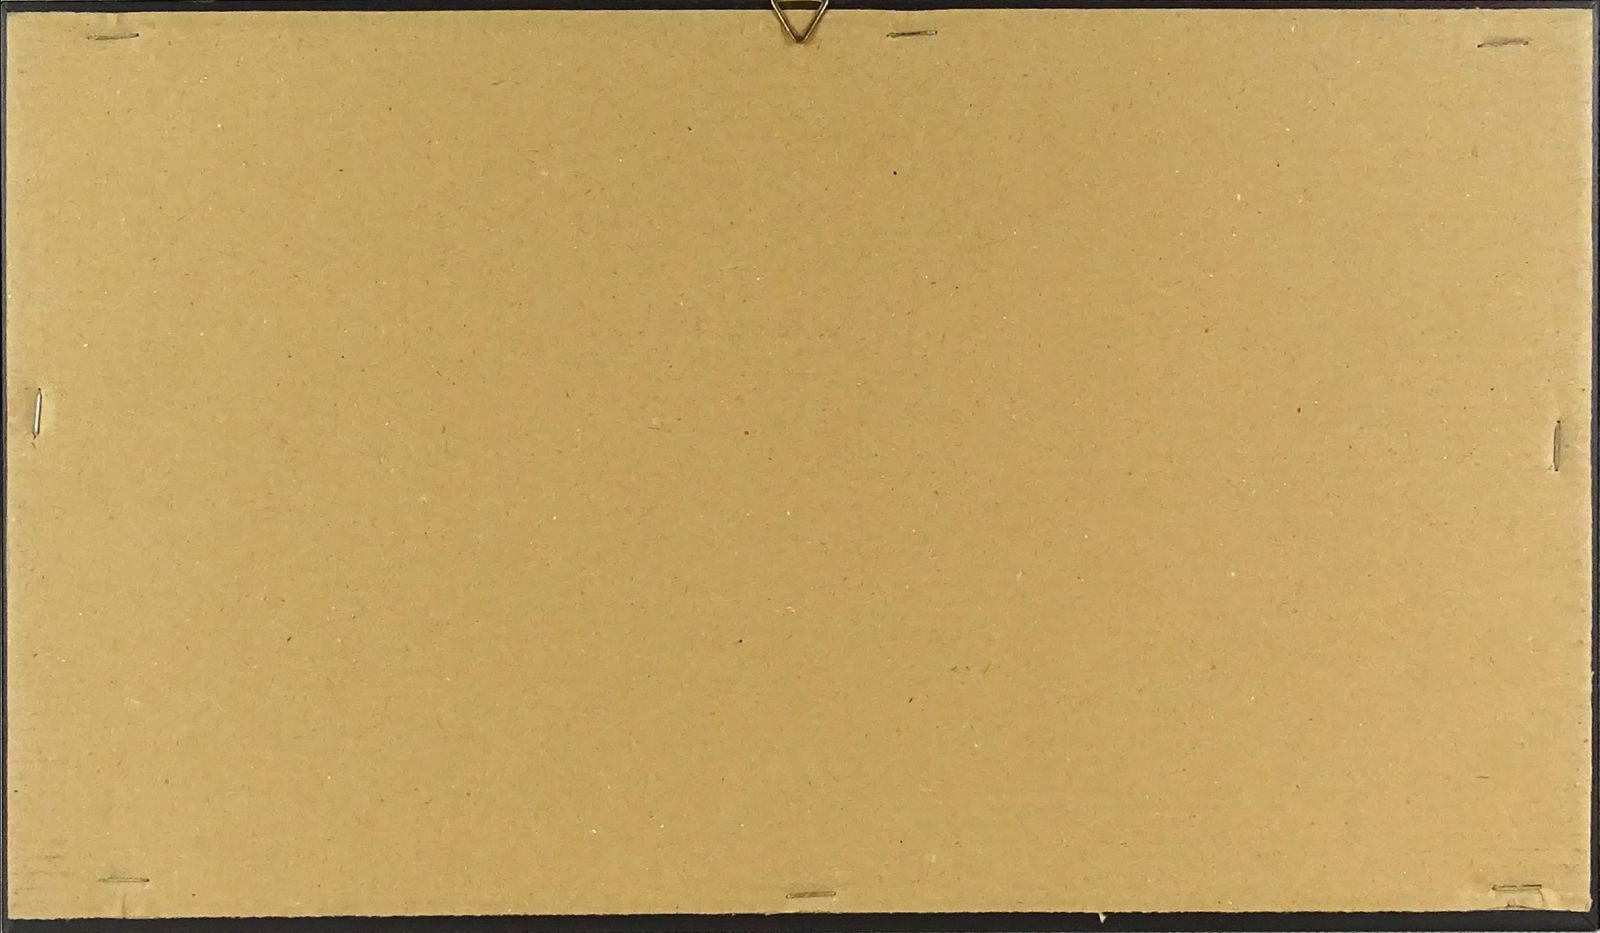 DSC04629.JPG (1600×933)